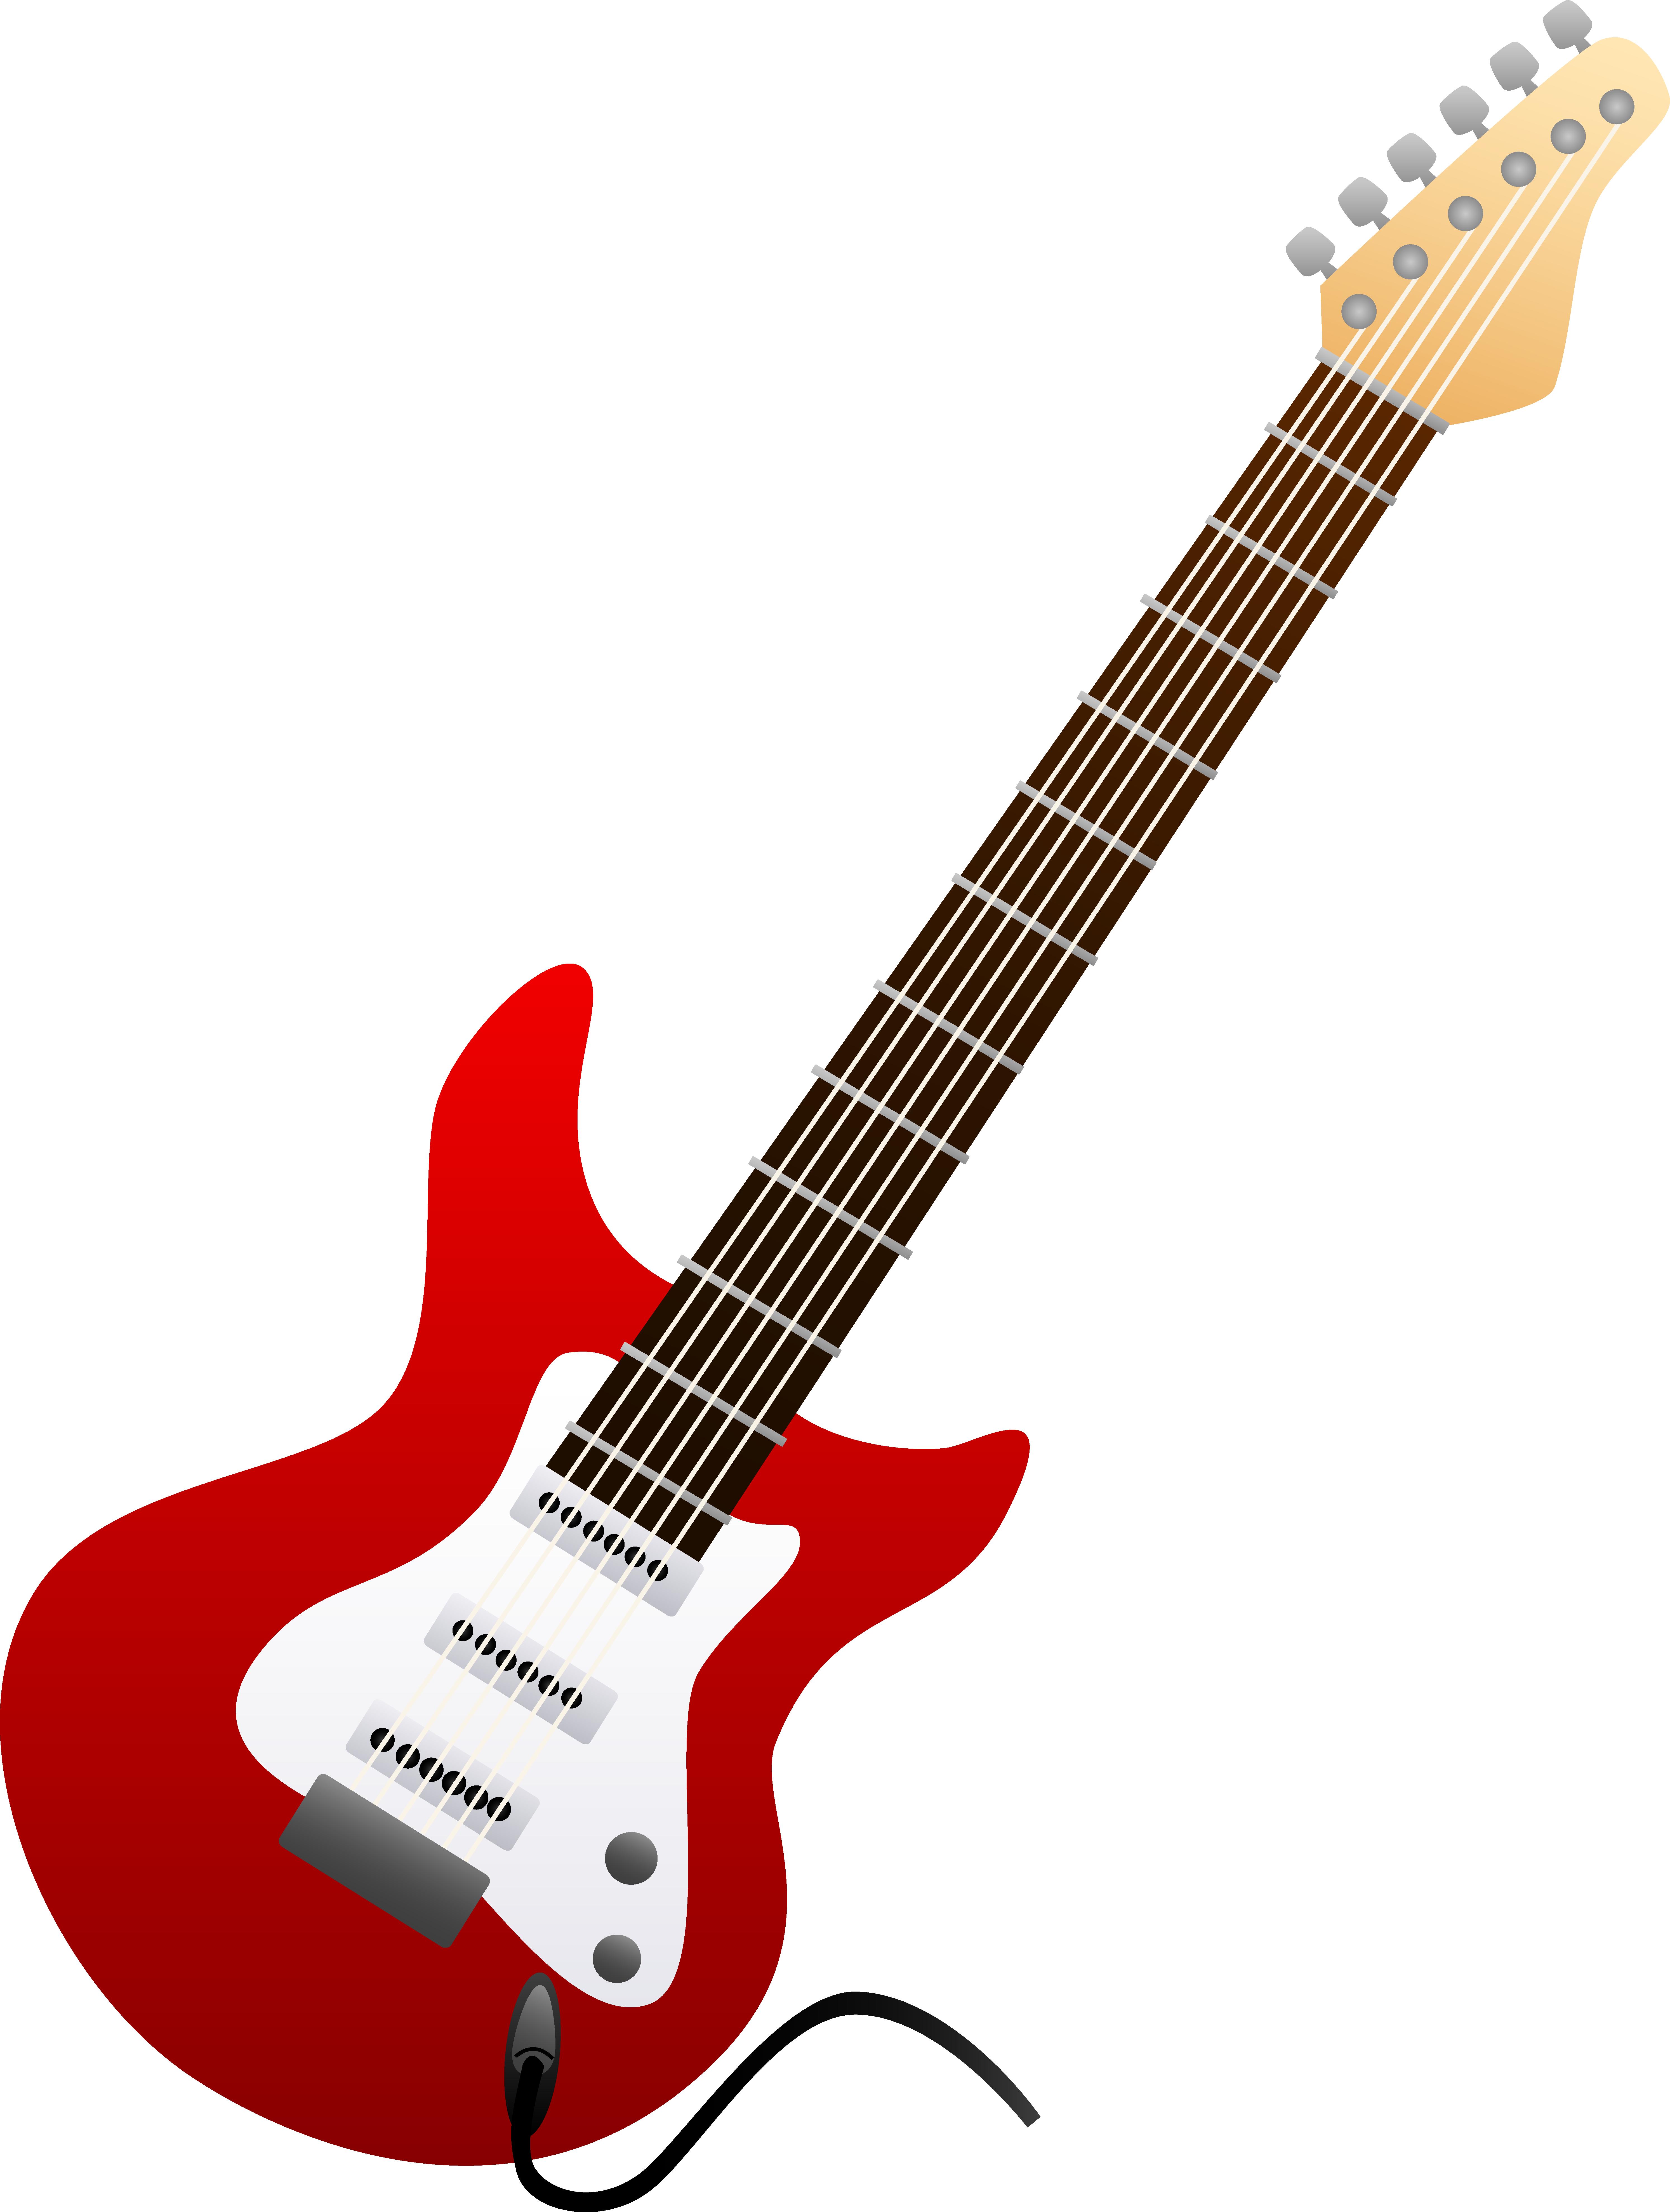 Red Electric Guitar Wallpaper